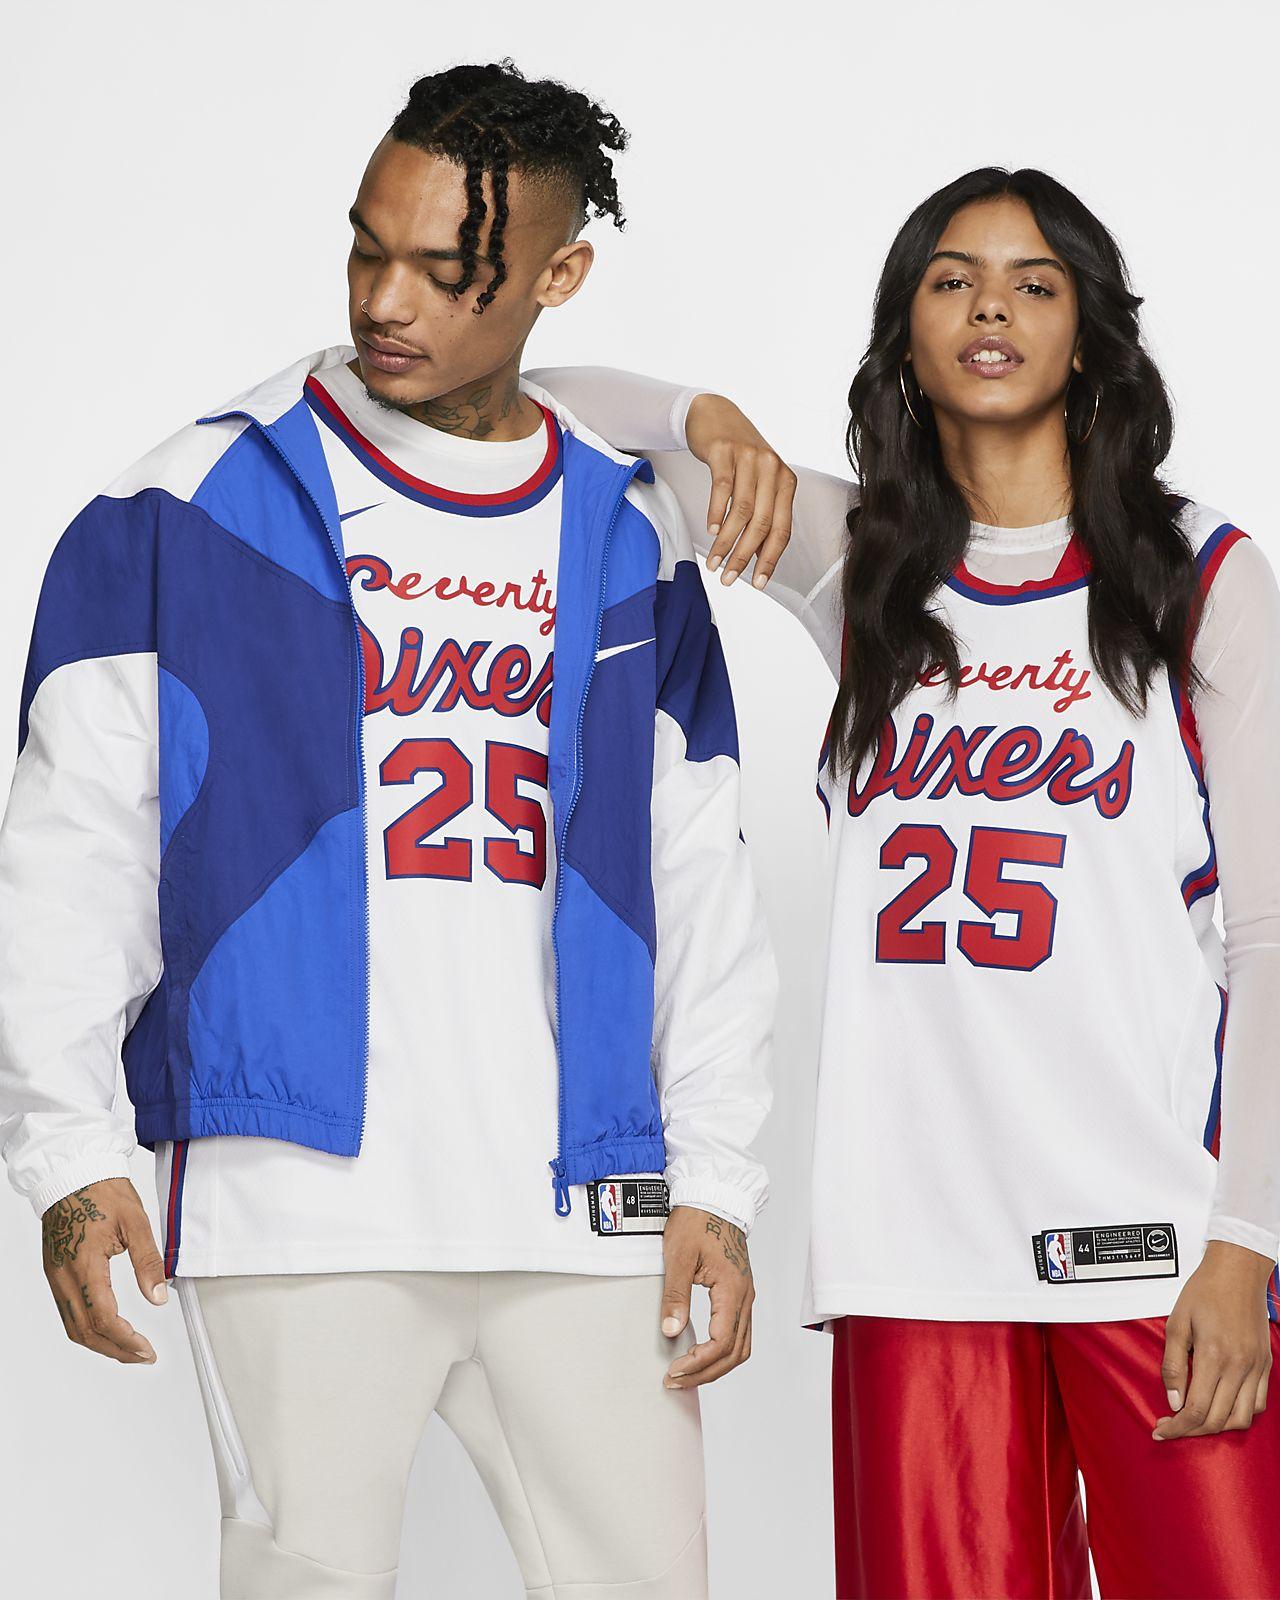 Ben Simmons 76ers Classic Edition Nike NBA Swingman Jersey